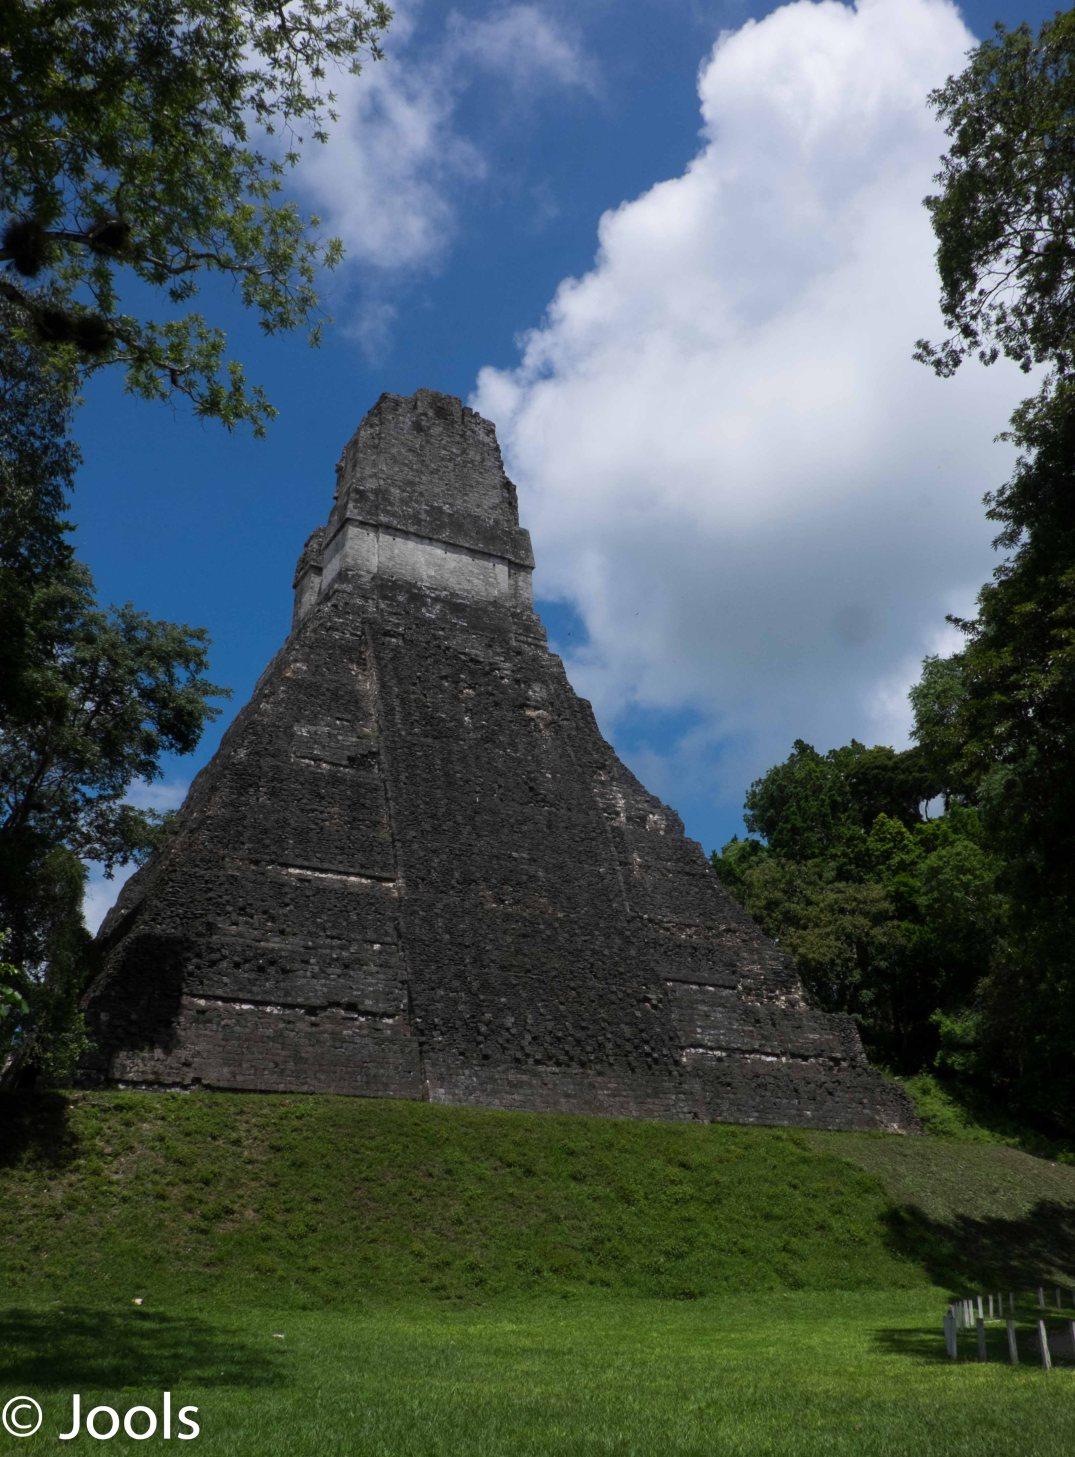 Tikal pyramid lowres